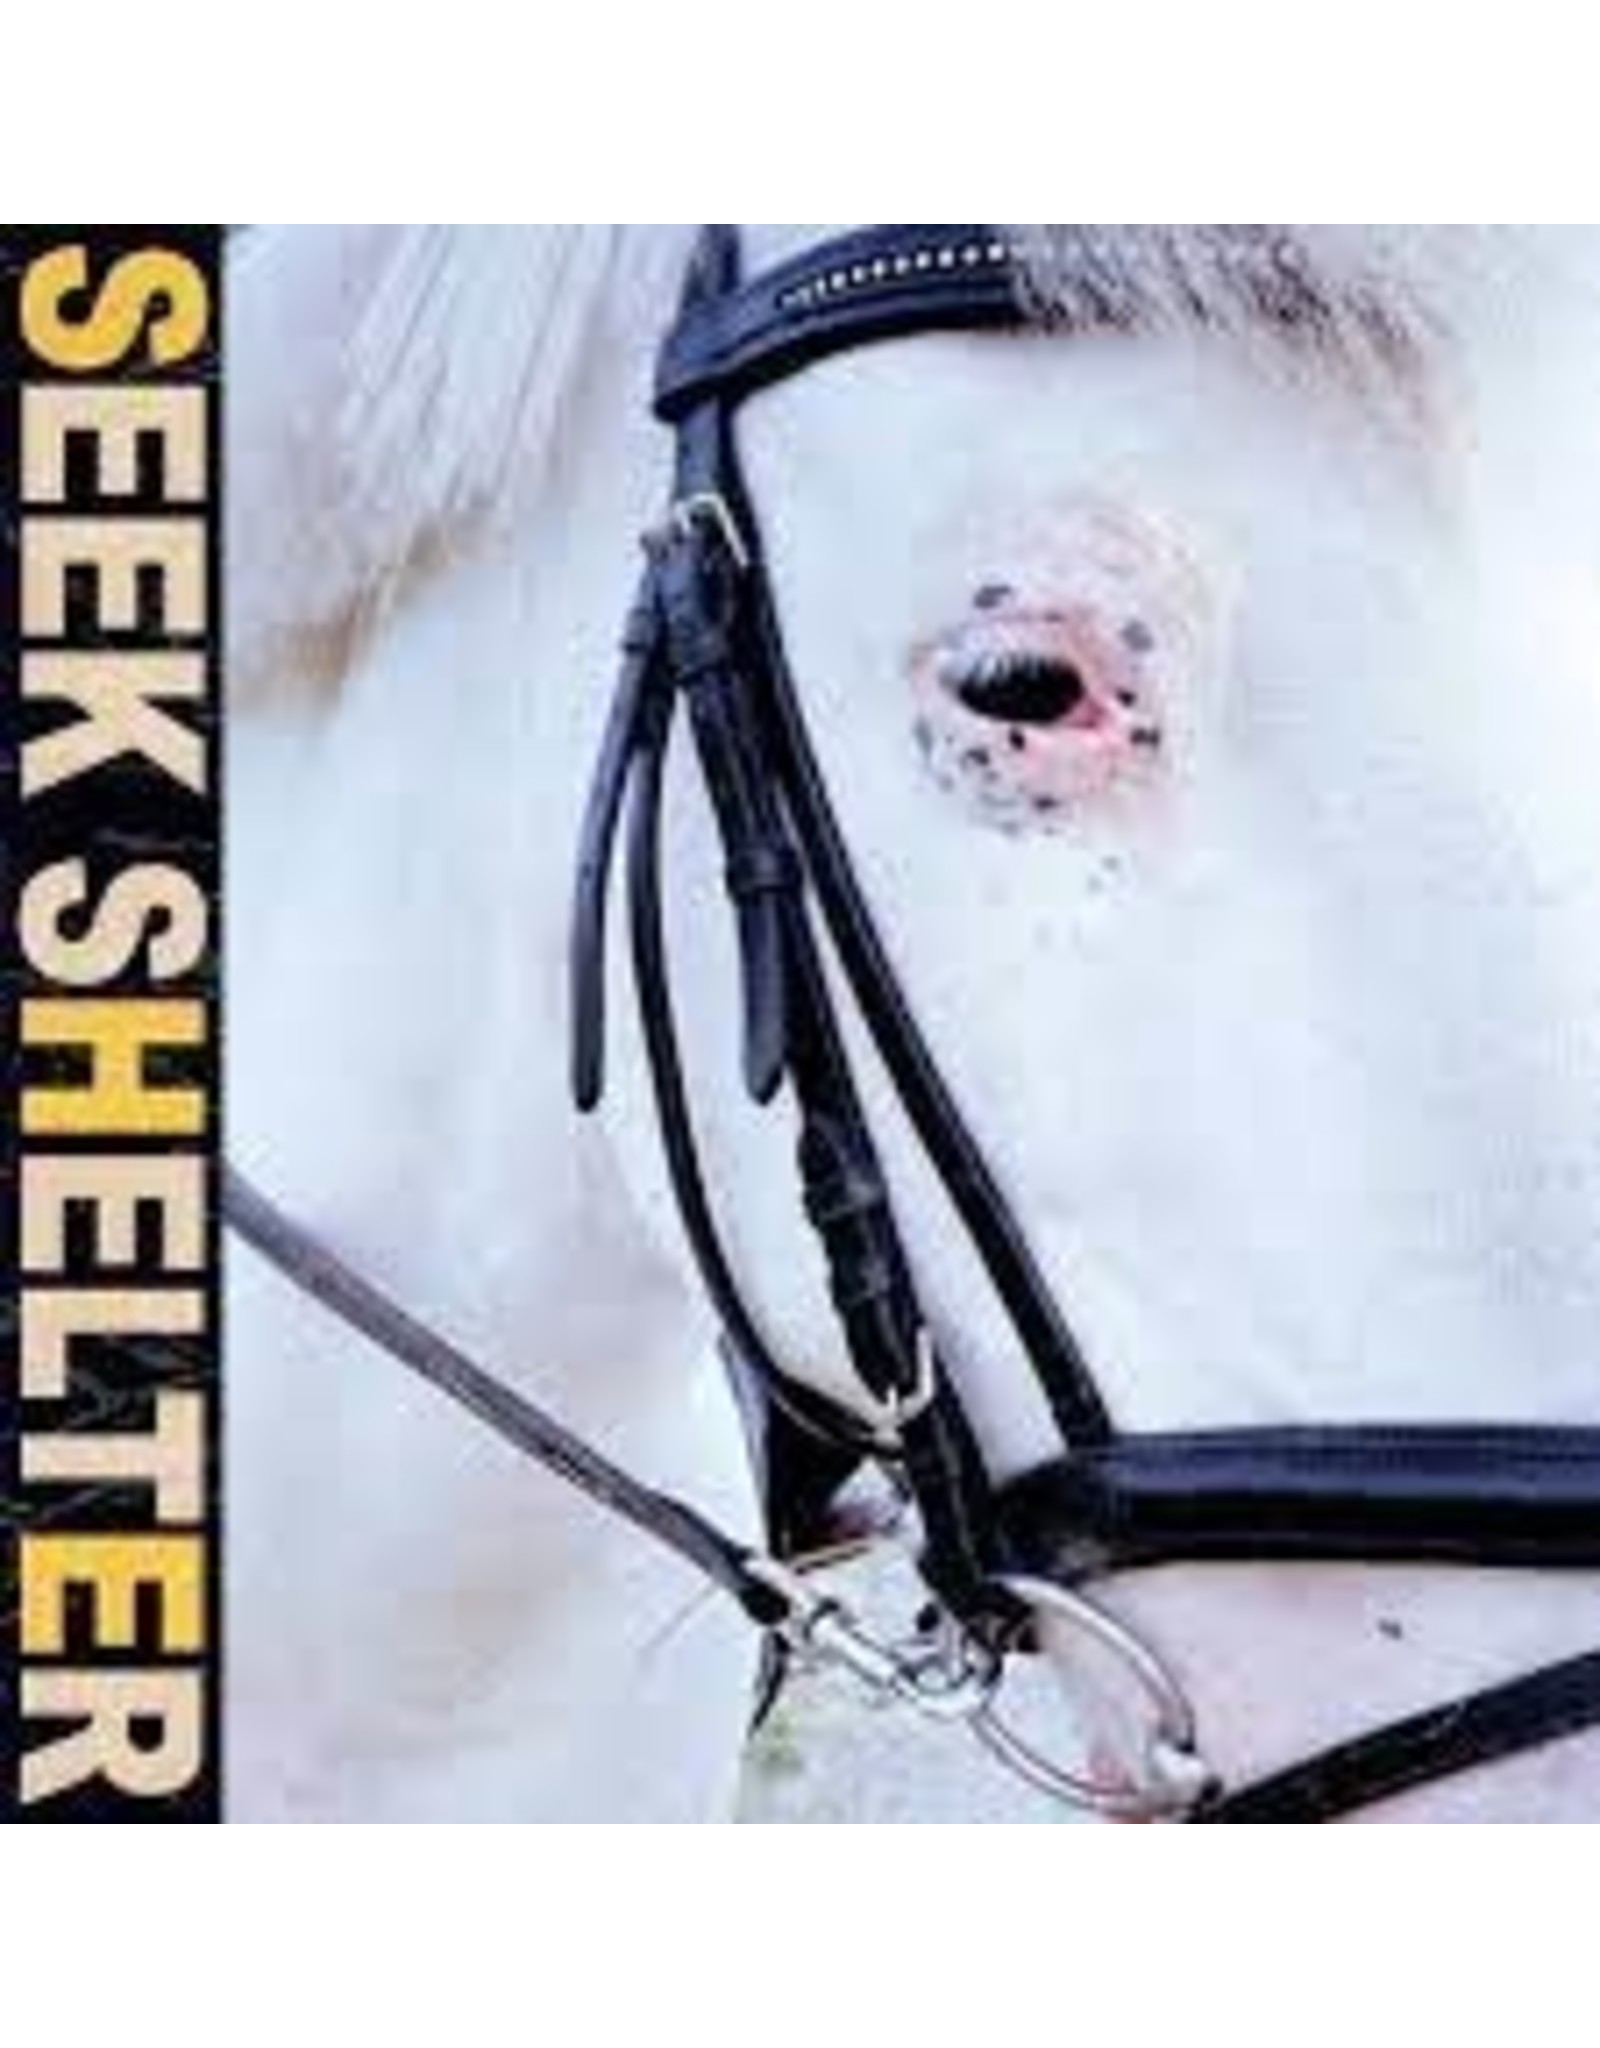 Iceage - Seek Shelter LP (Orange Vinyl)